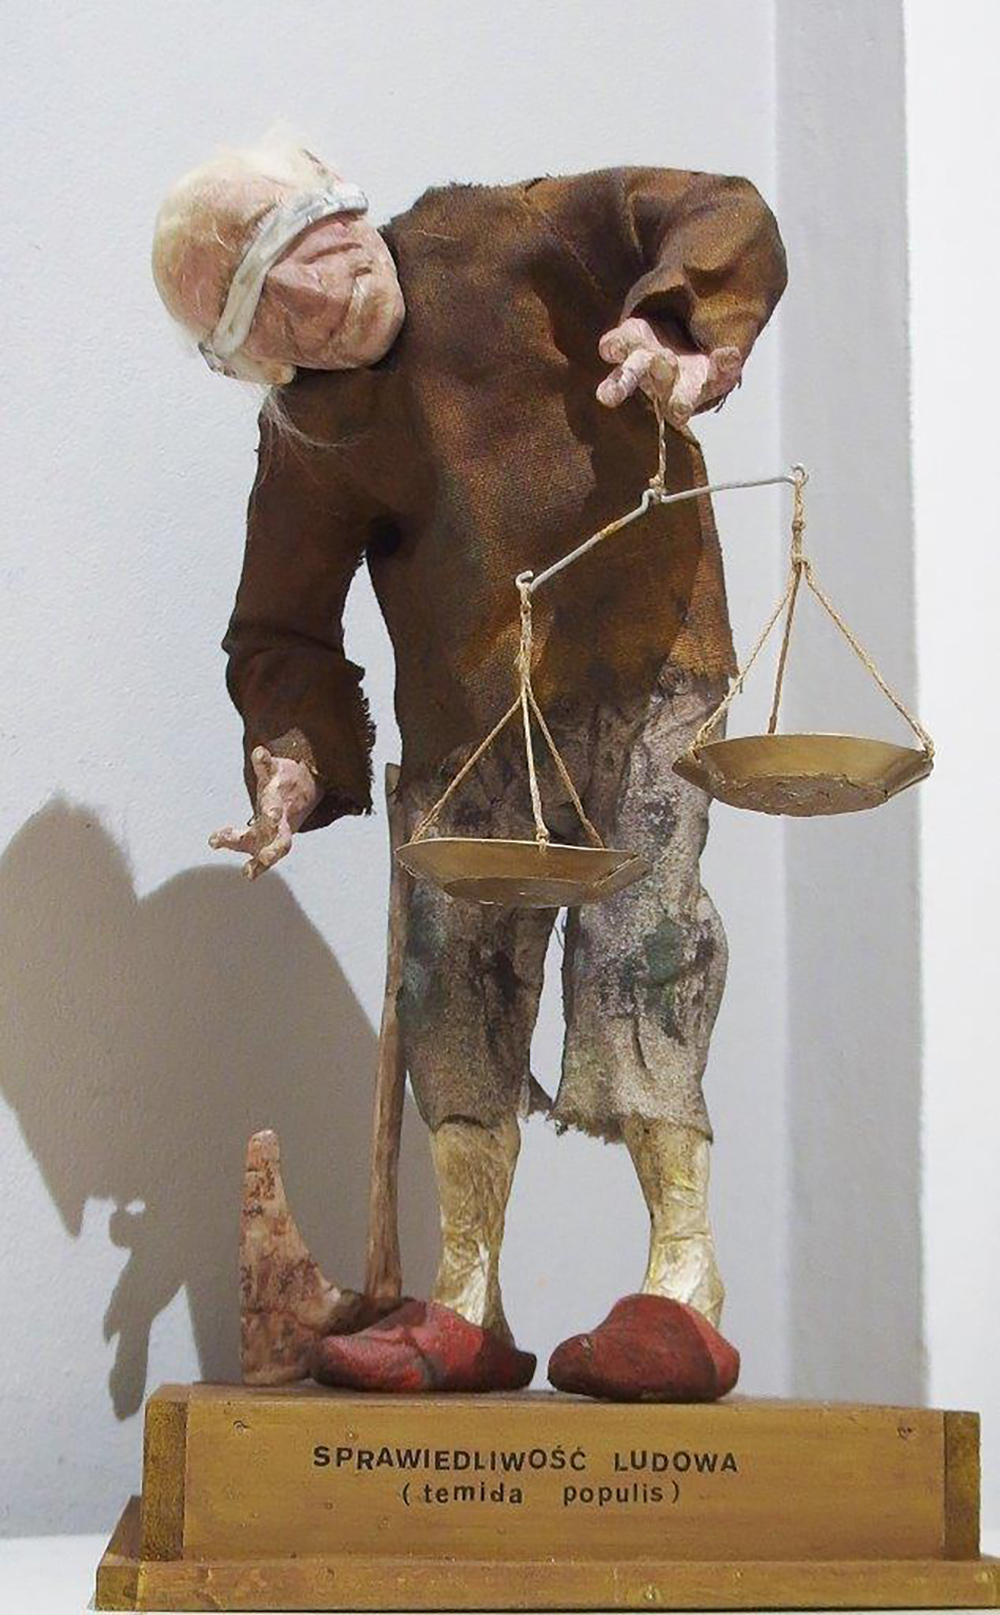 Leszek Jasiński : People's justice